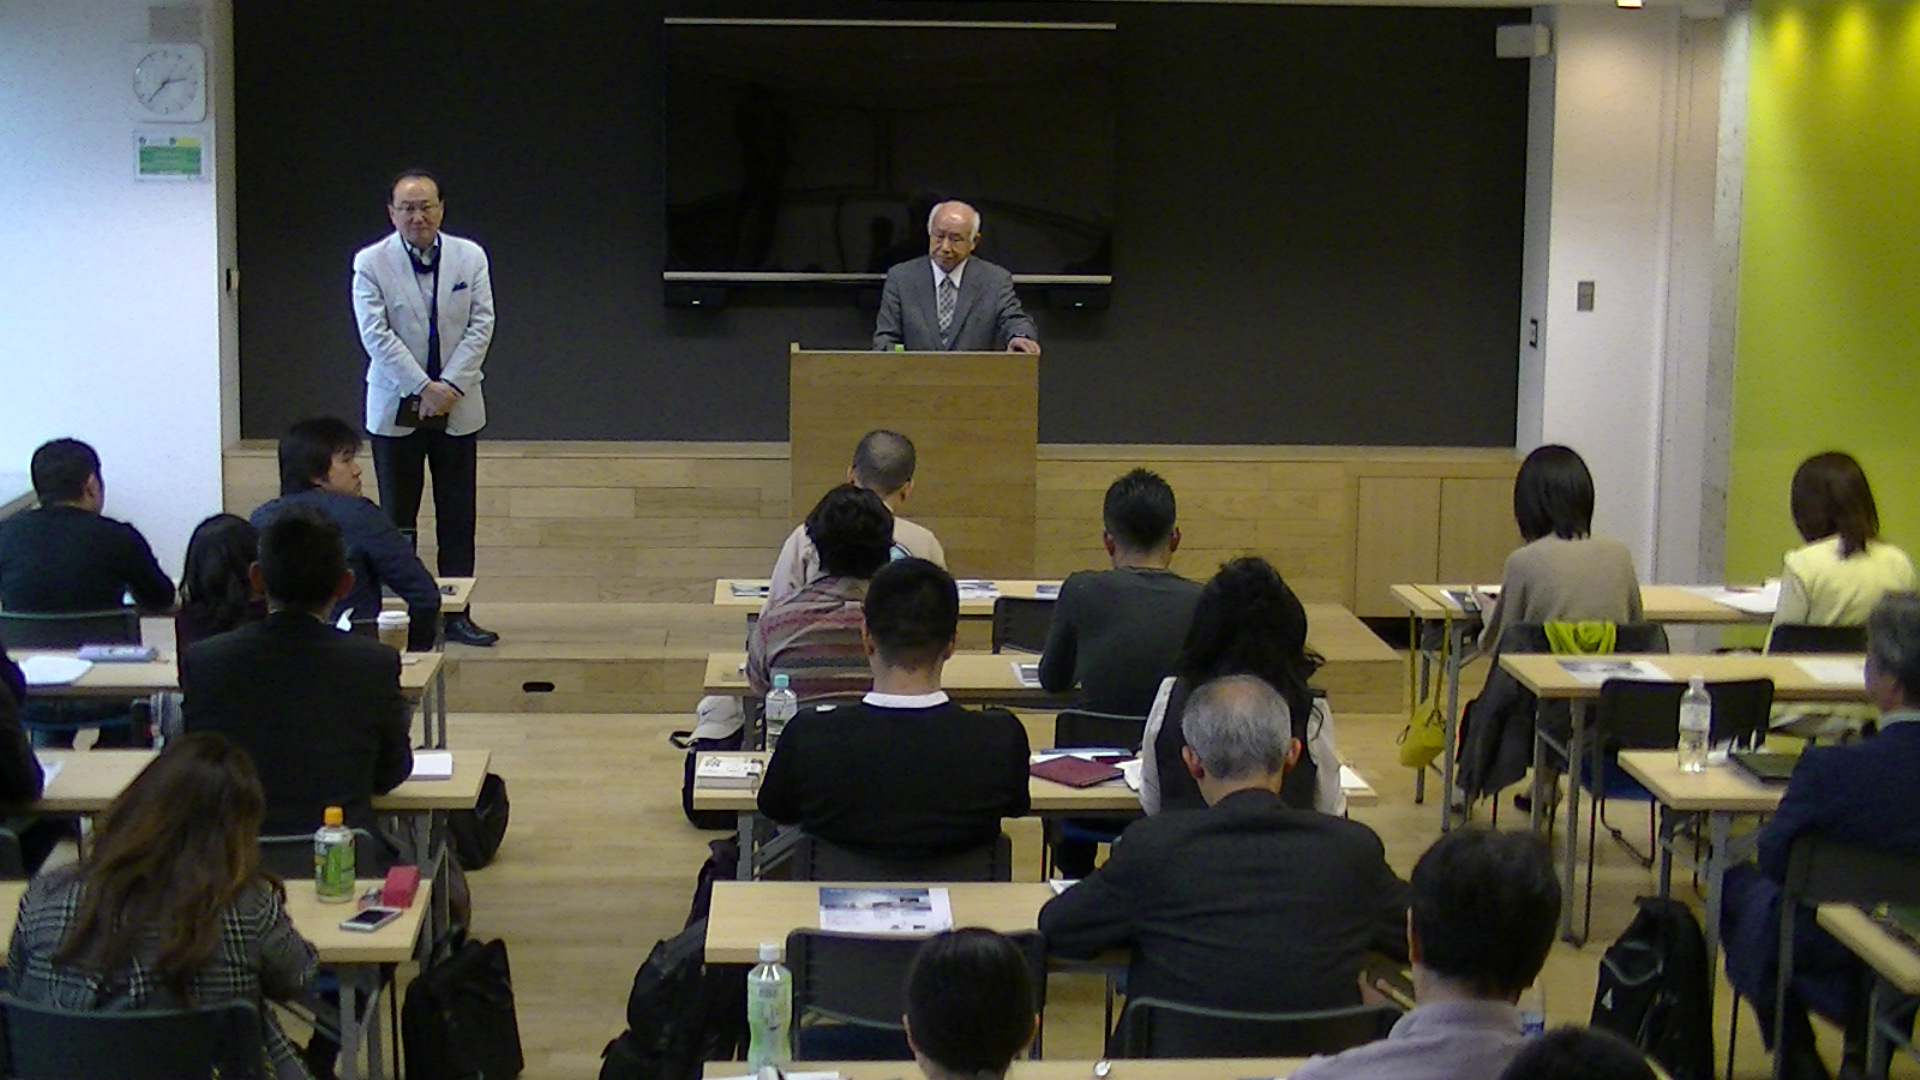 PIC 0562 - 4月1日東京思風塾の開催になります。